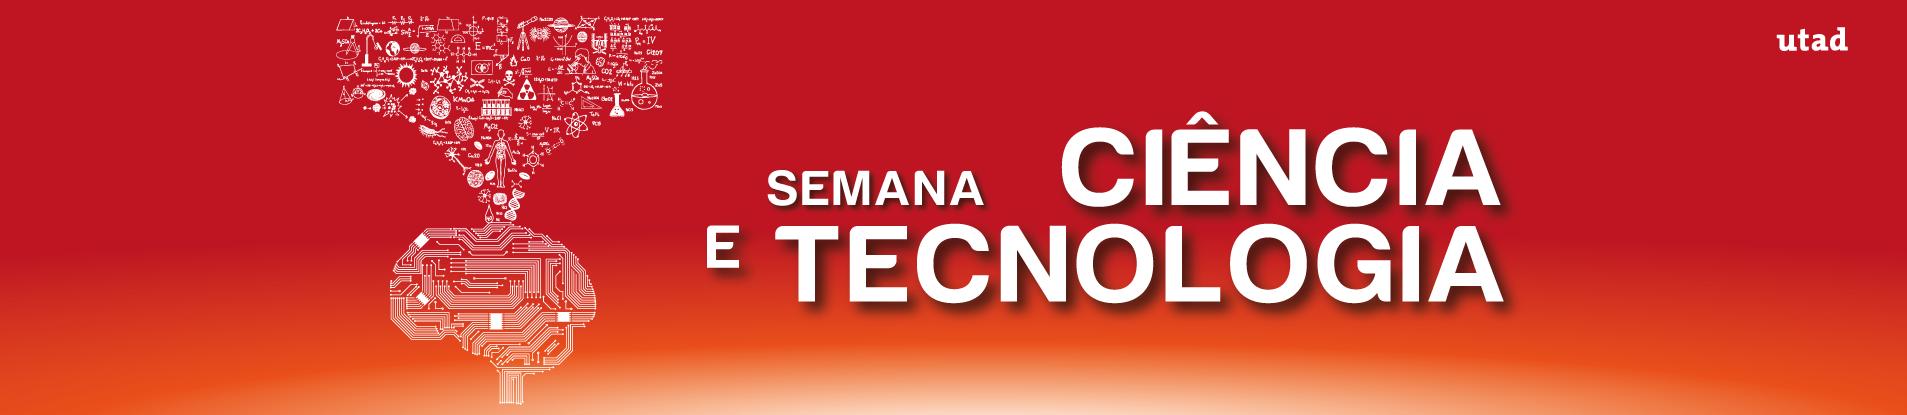 slider semana ciencia tecnologia 2019